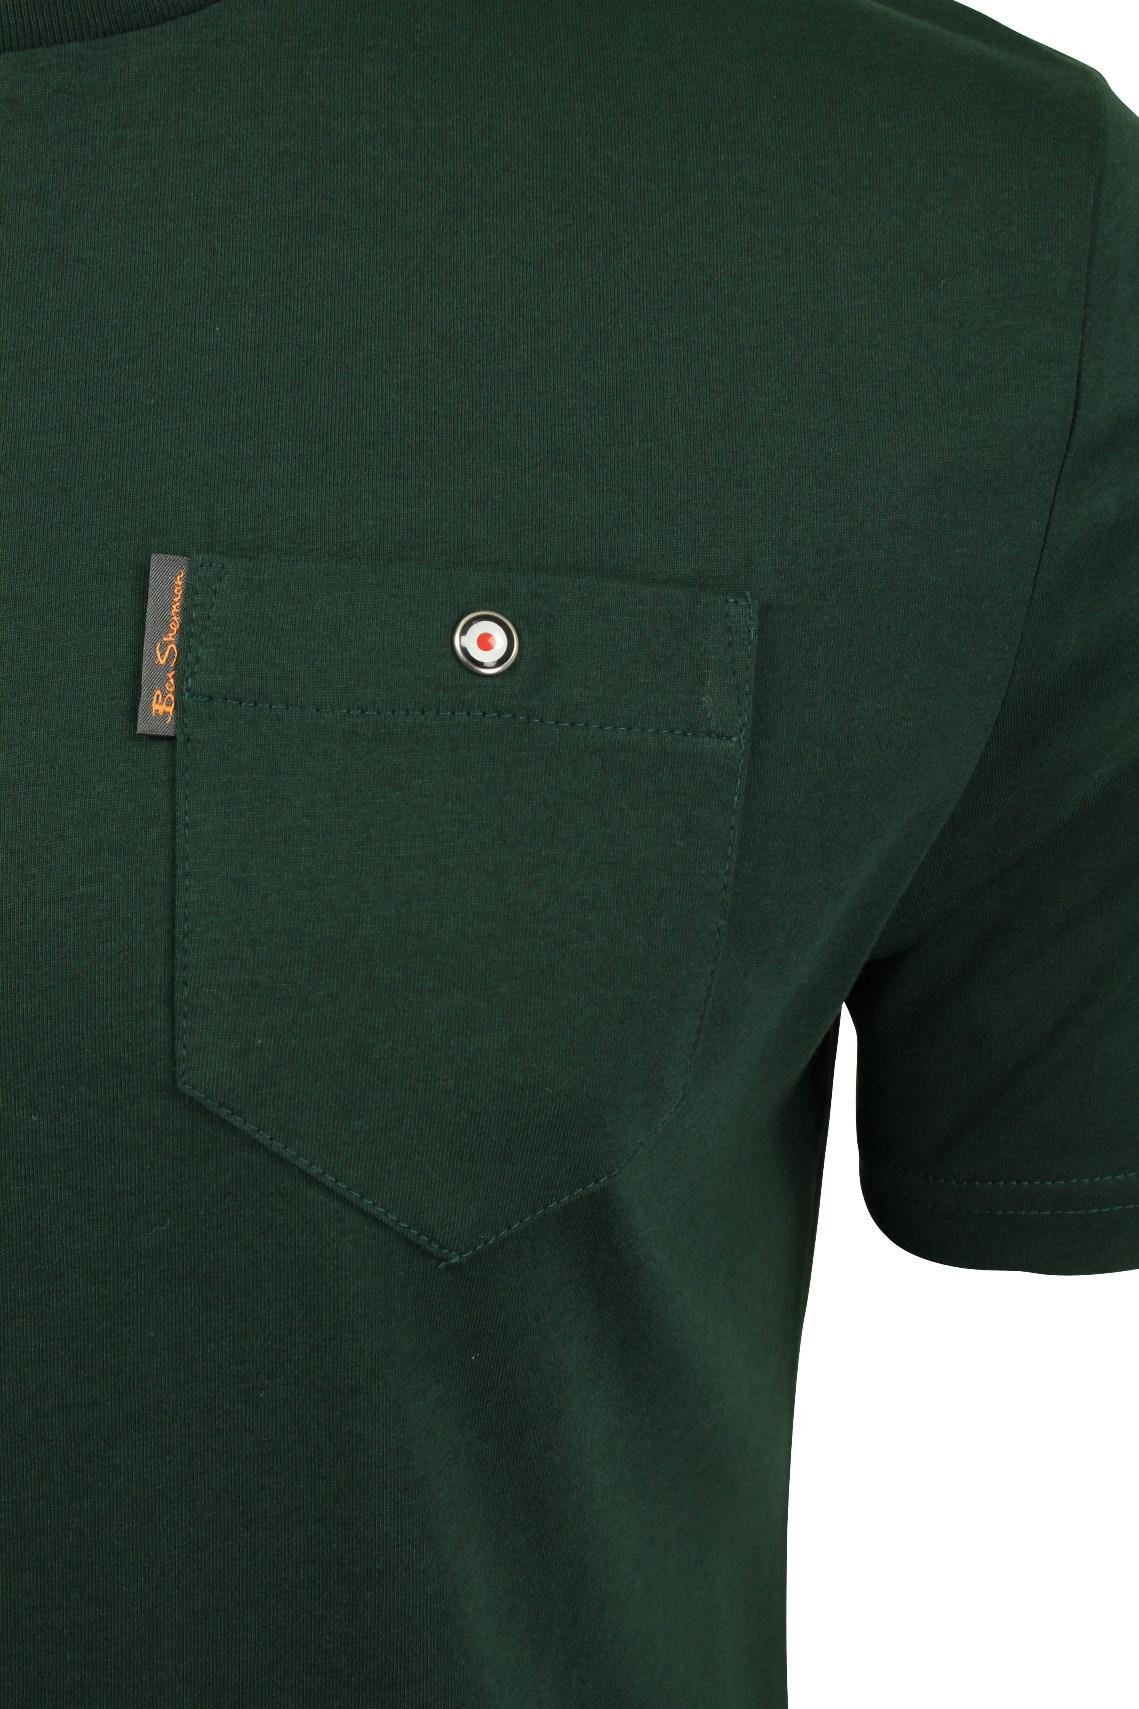 Mens-Classic-Spade-Pocket-T-Shirt-by-Ben-Sherman thumbnail 15